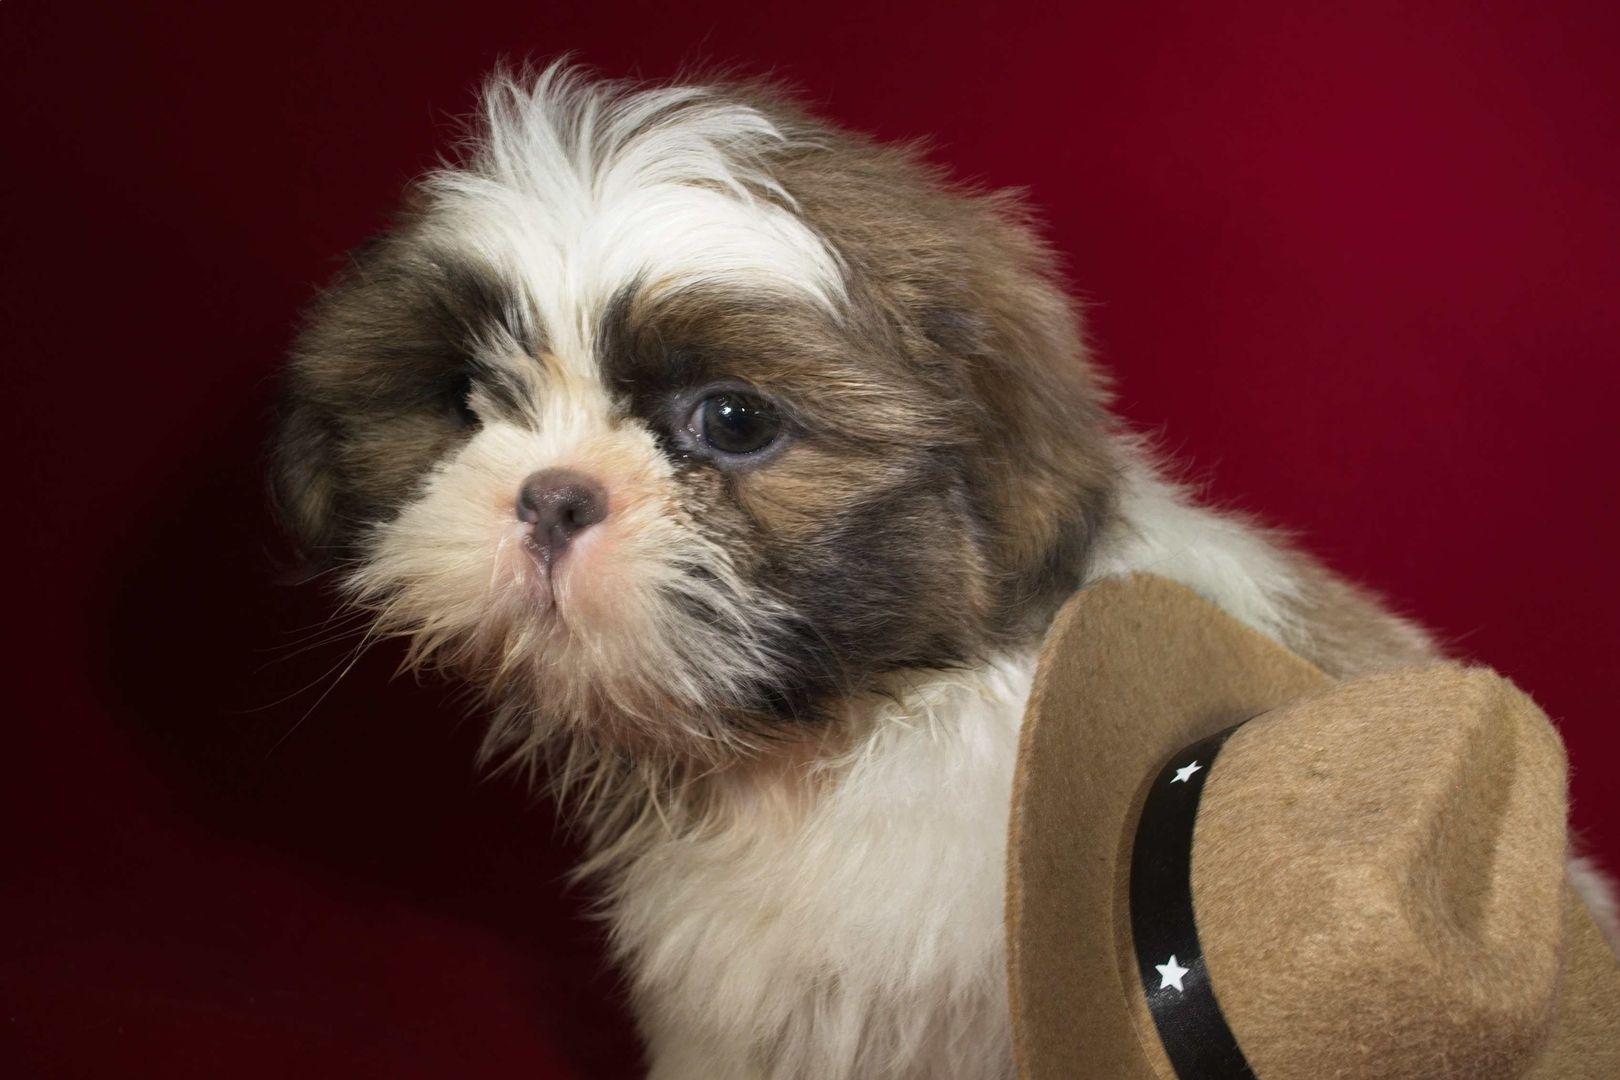 Http Www Mysticmountainkennels Com Puppies For Sale Html Puppies Yorkshire Terrier Shih Tzu Puppy